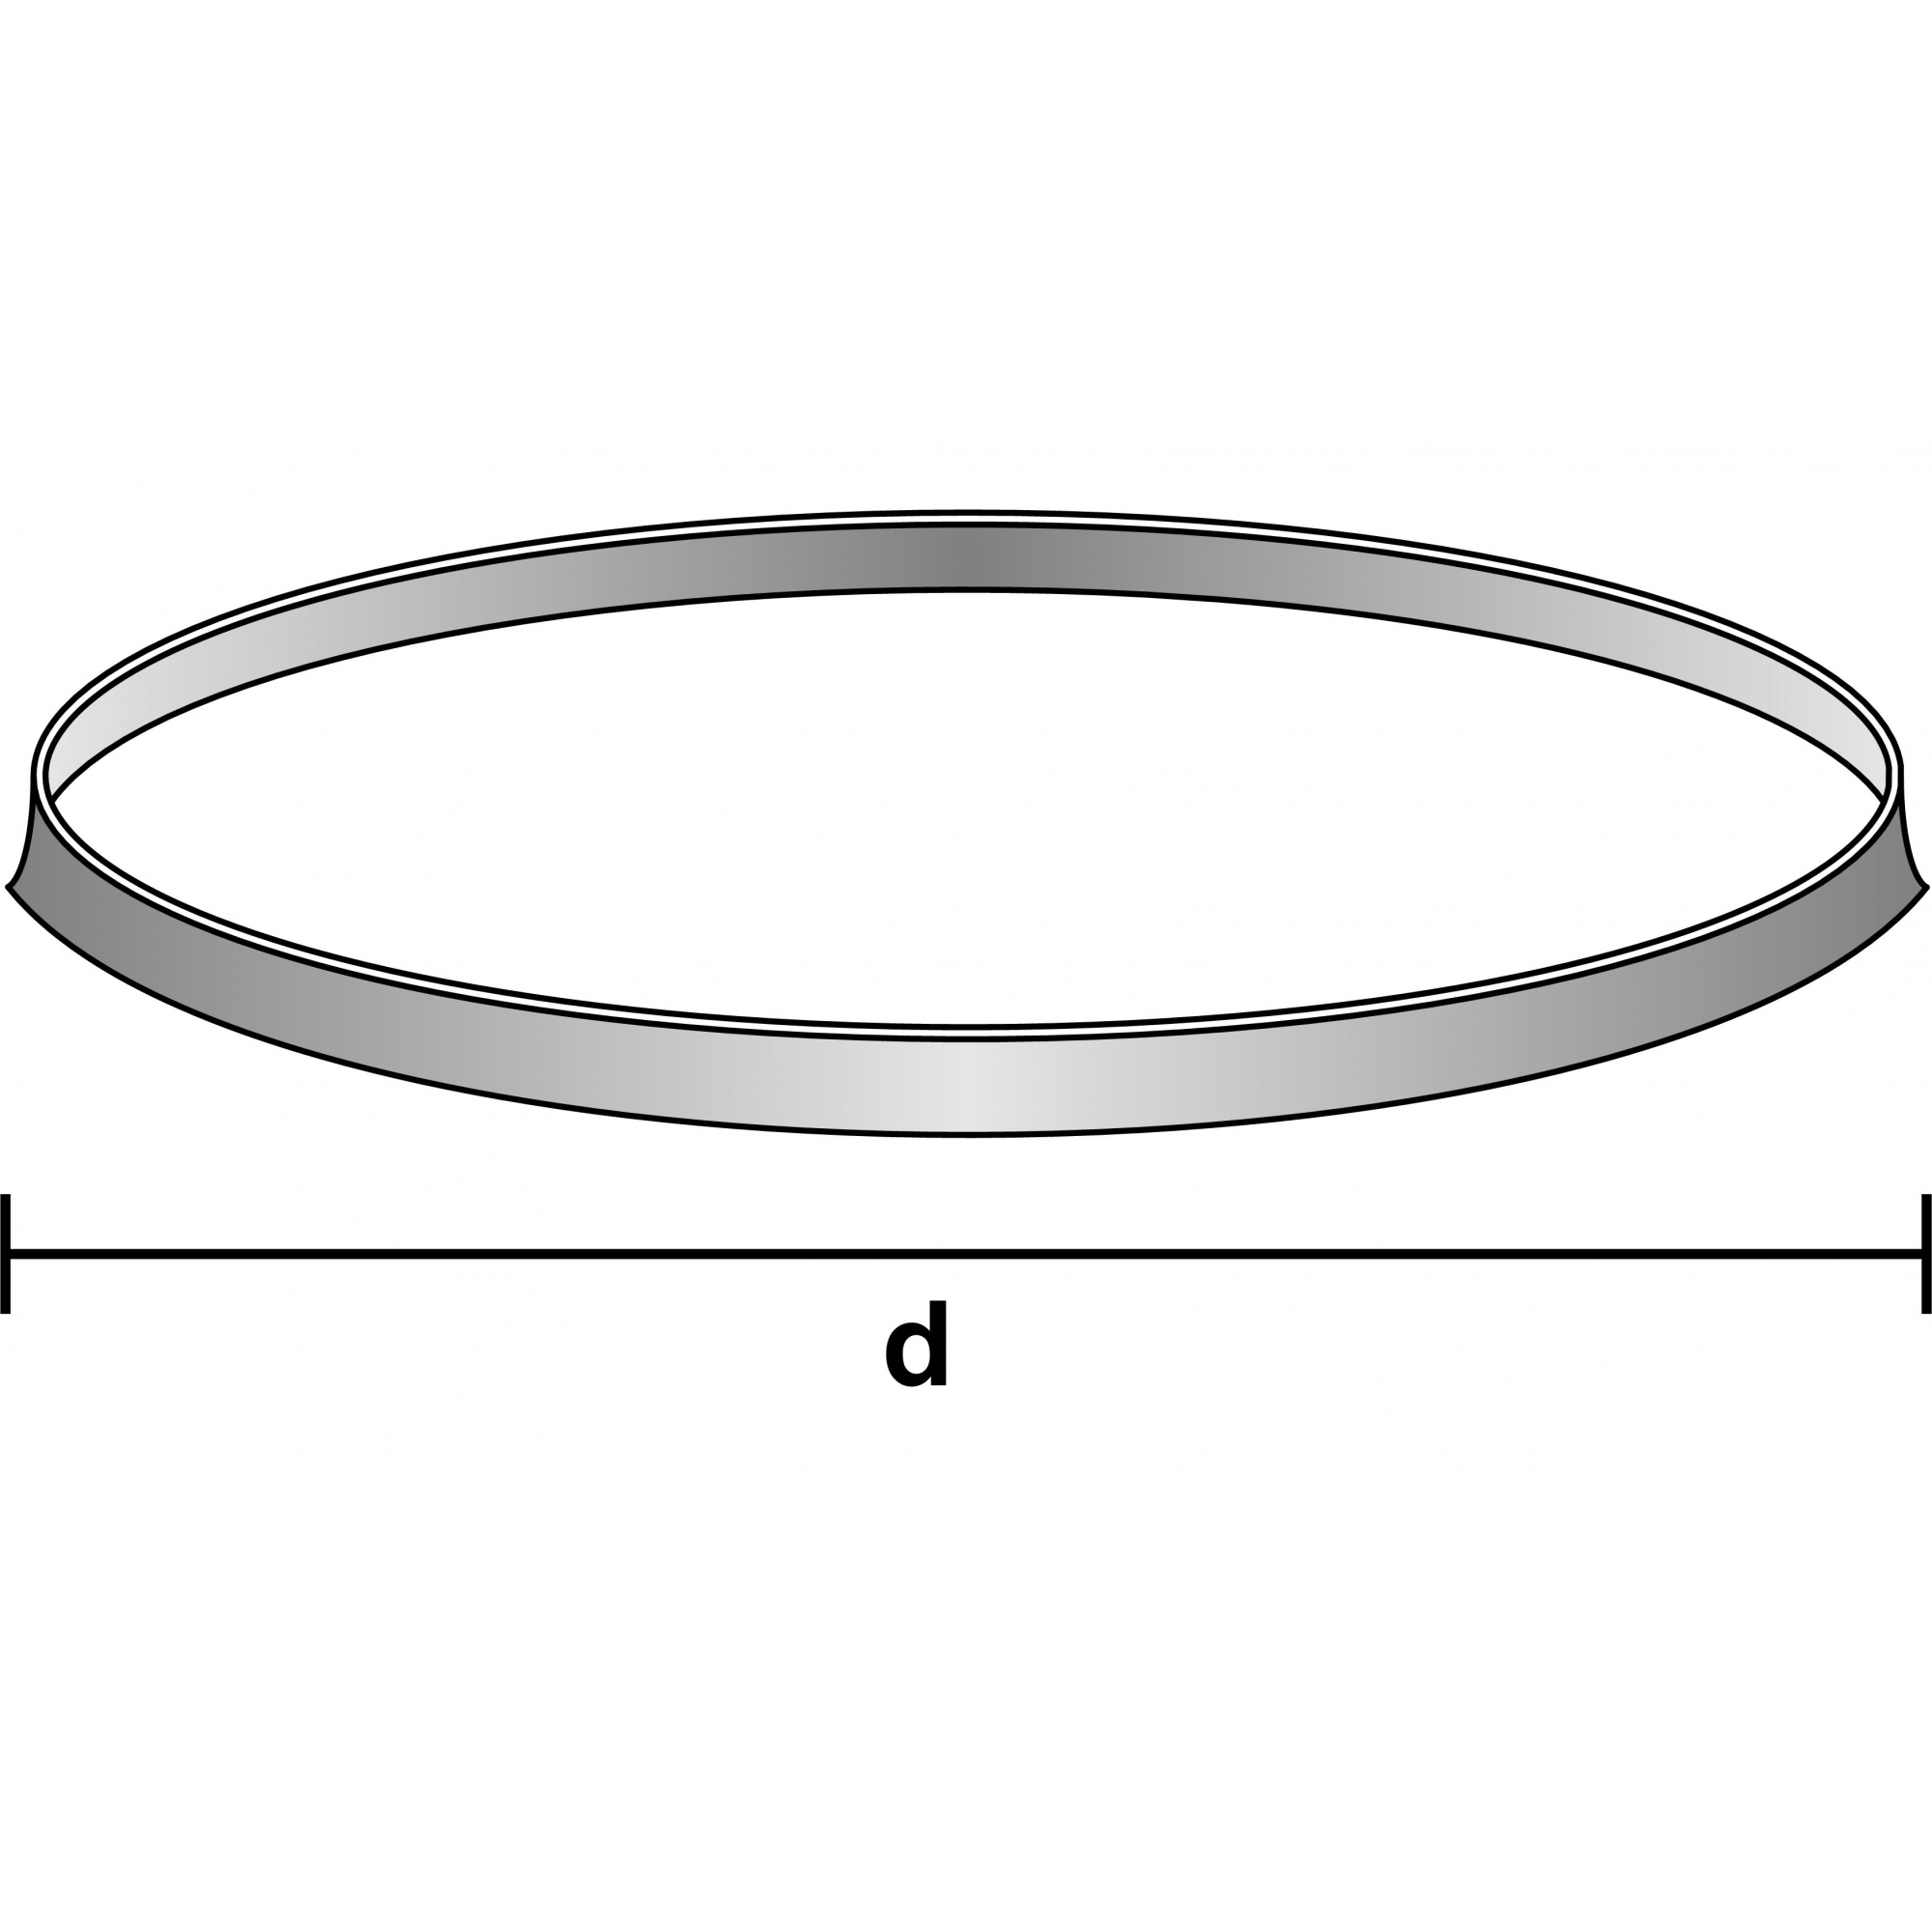 ANEL ORING EM POLIPROPILENO AMARELO GL 45 - Laborglas - Cód. 9924428